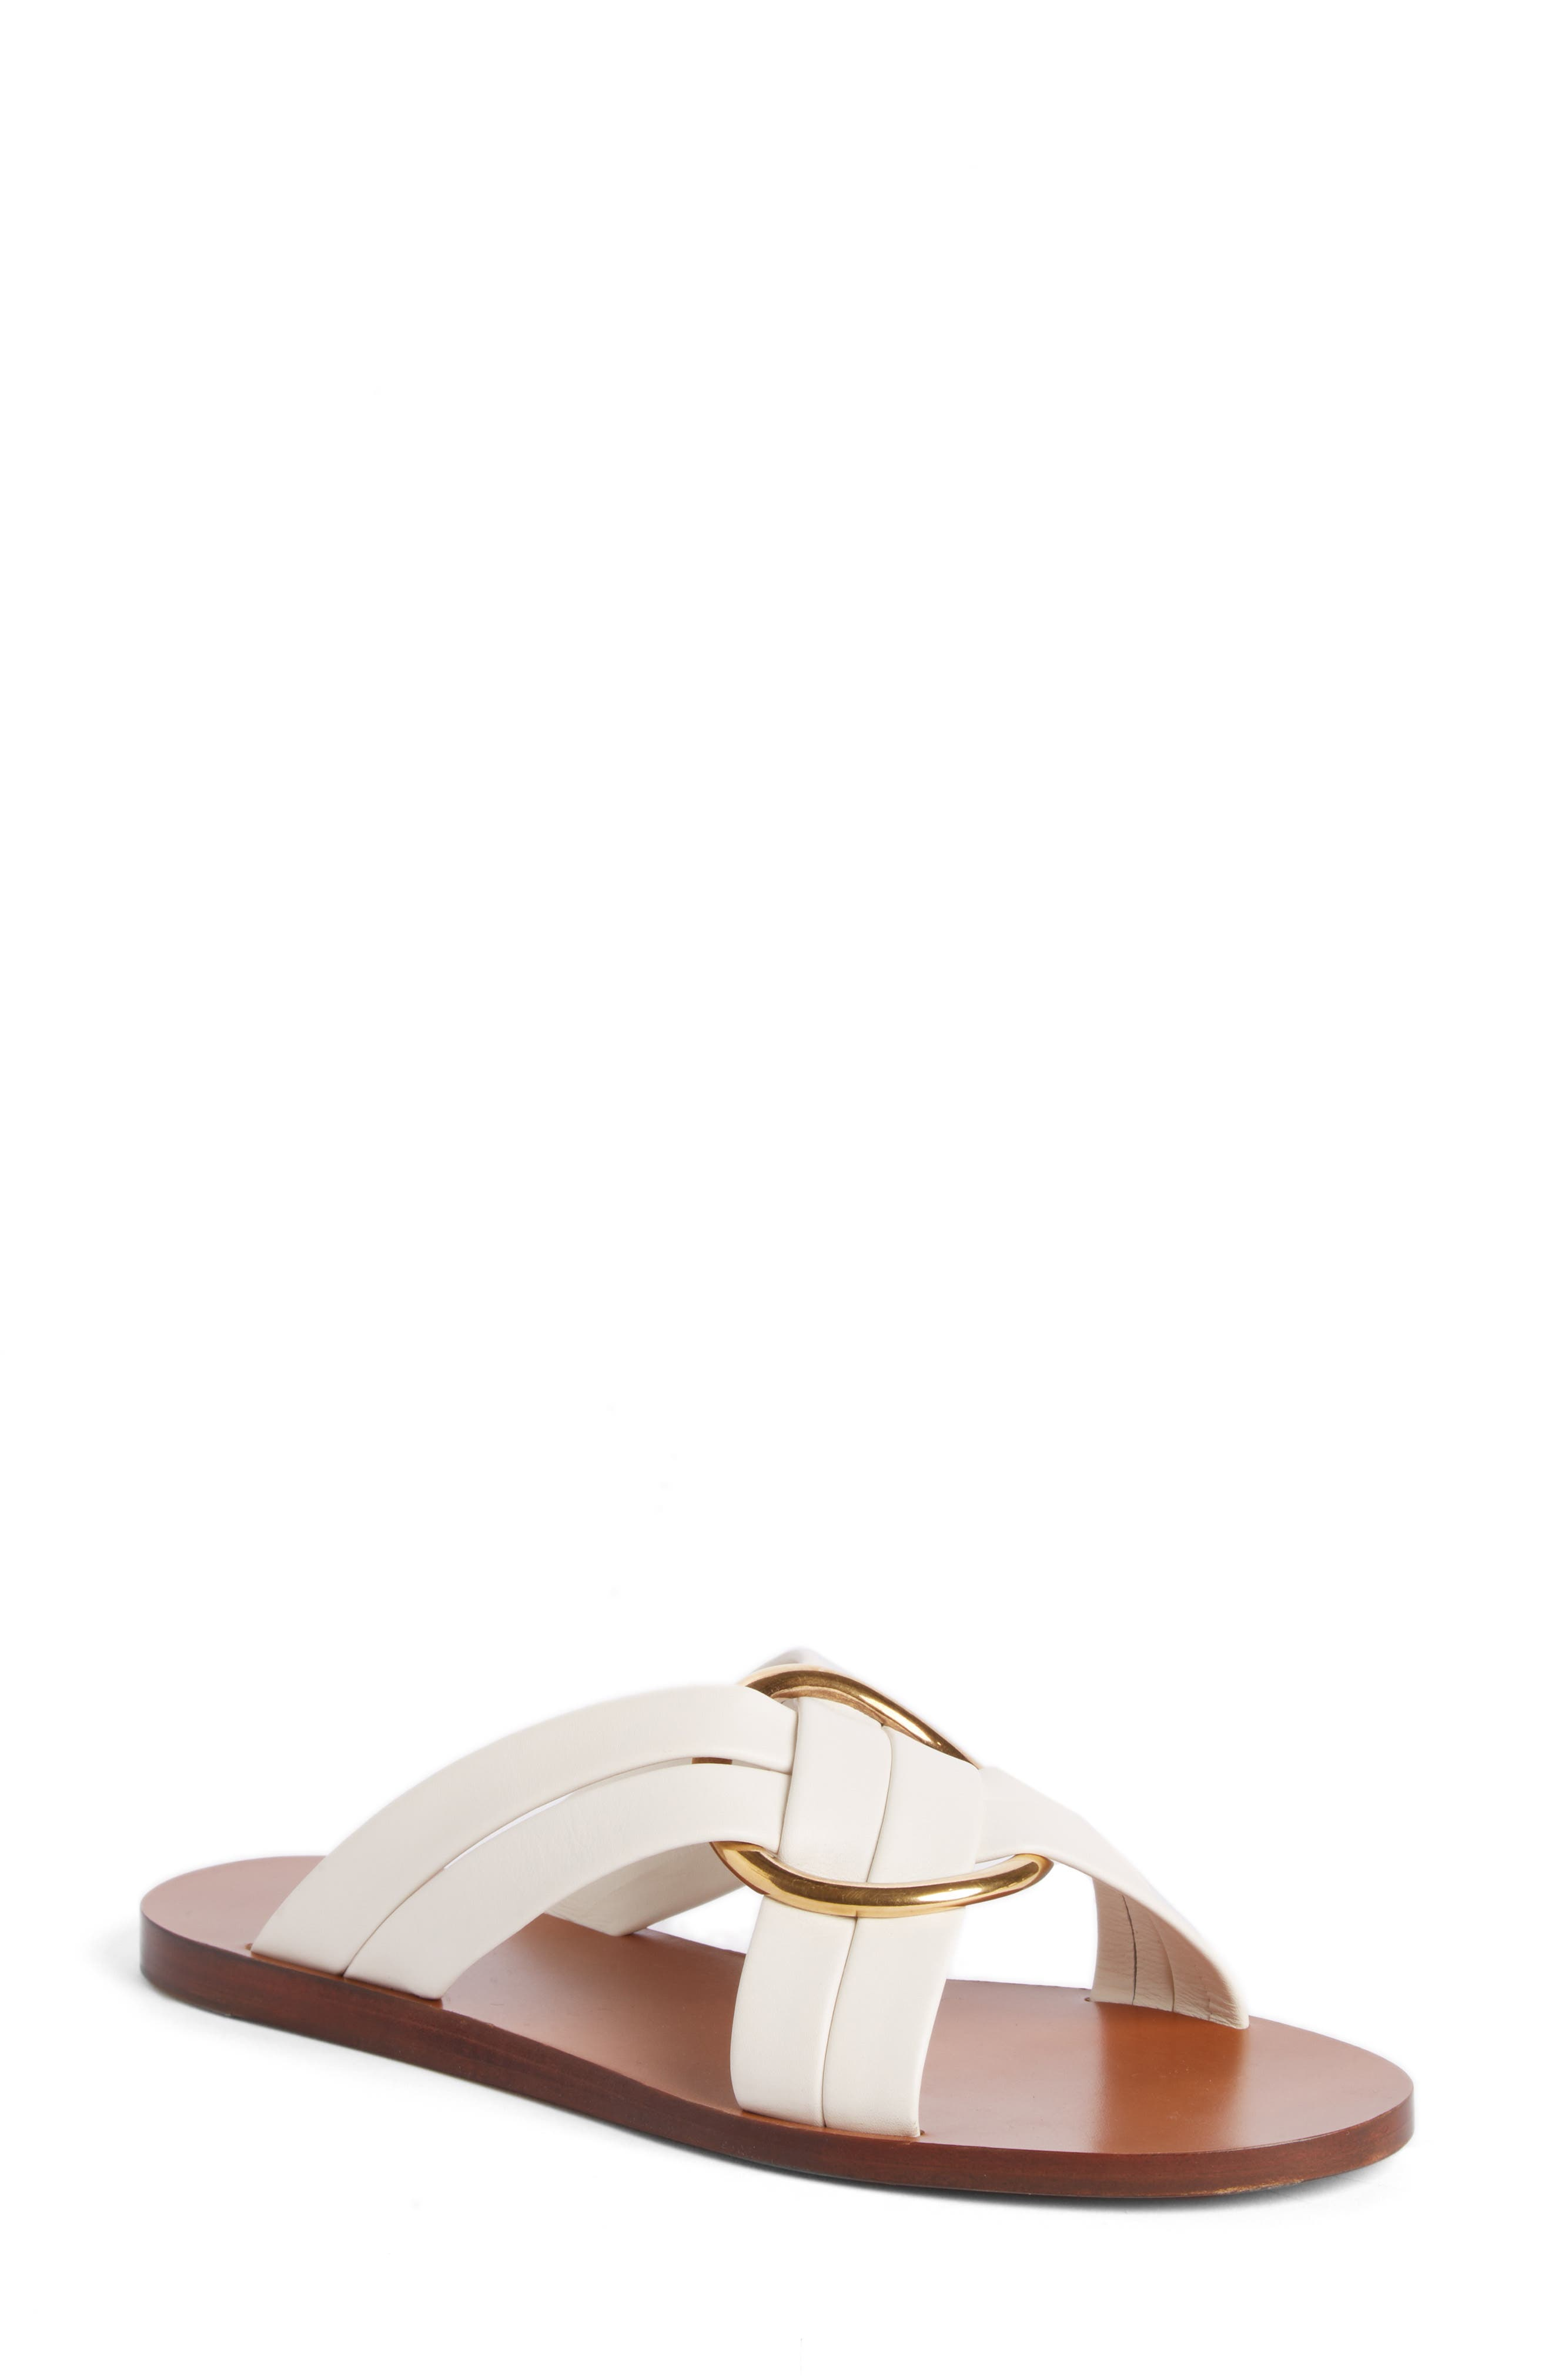 Chloé Rony Crisscross Flat Sandal (Women)